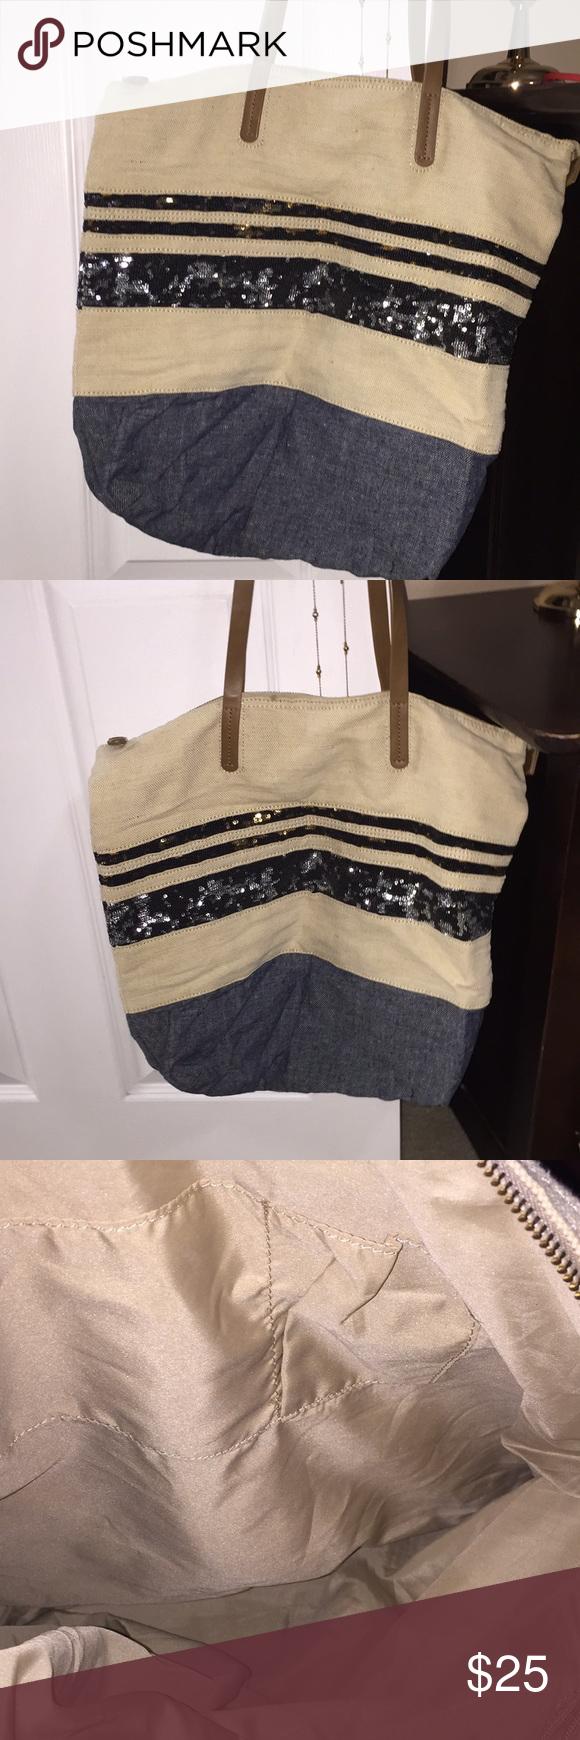 36c4e8ffb8 Gap canvas shoulder bag Gap canvas bag with sequence GAP Bags Shoulder Bags